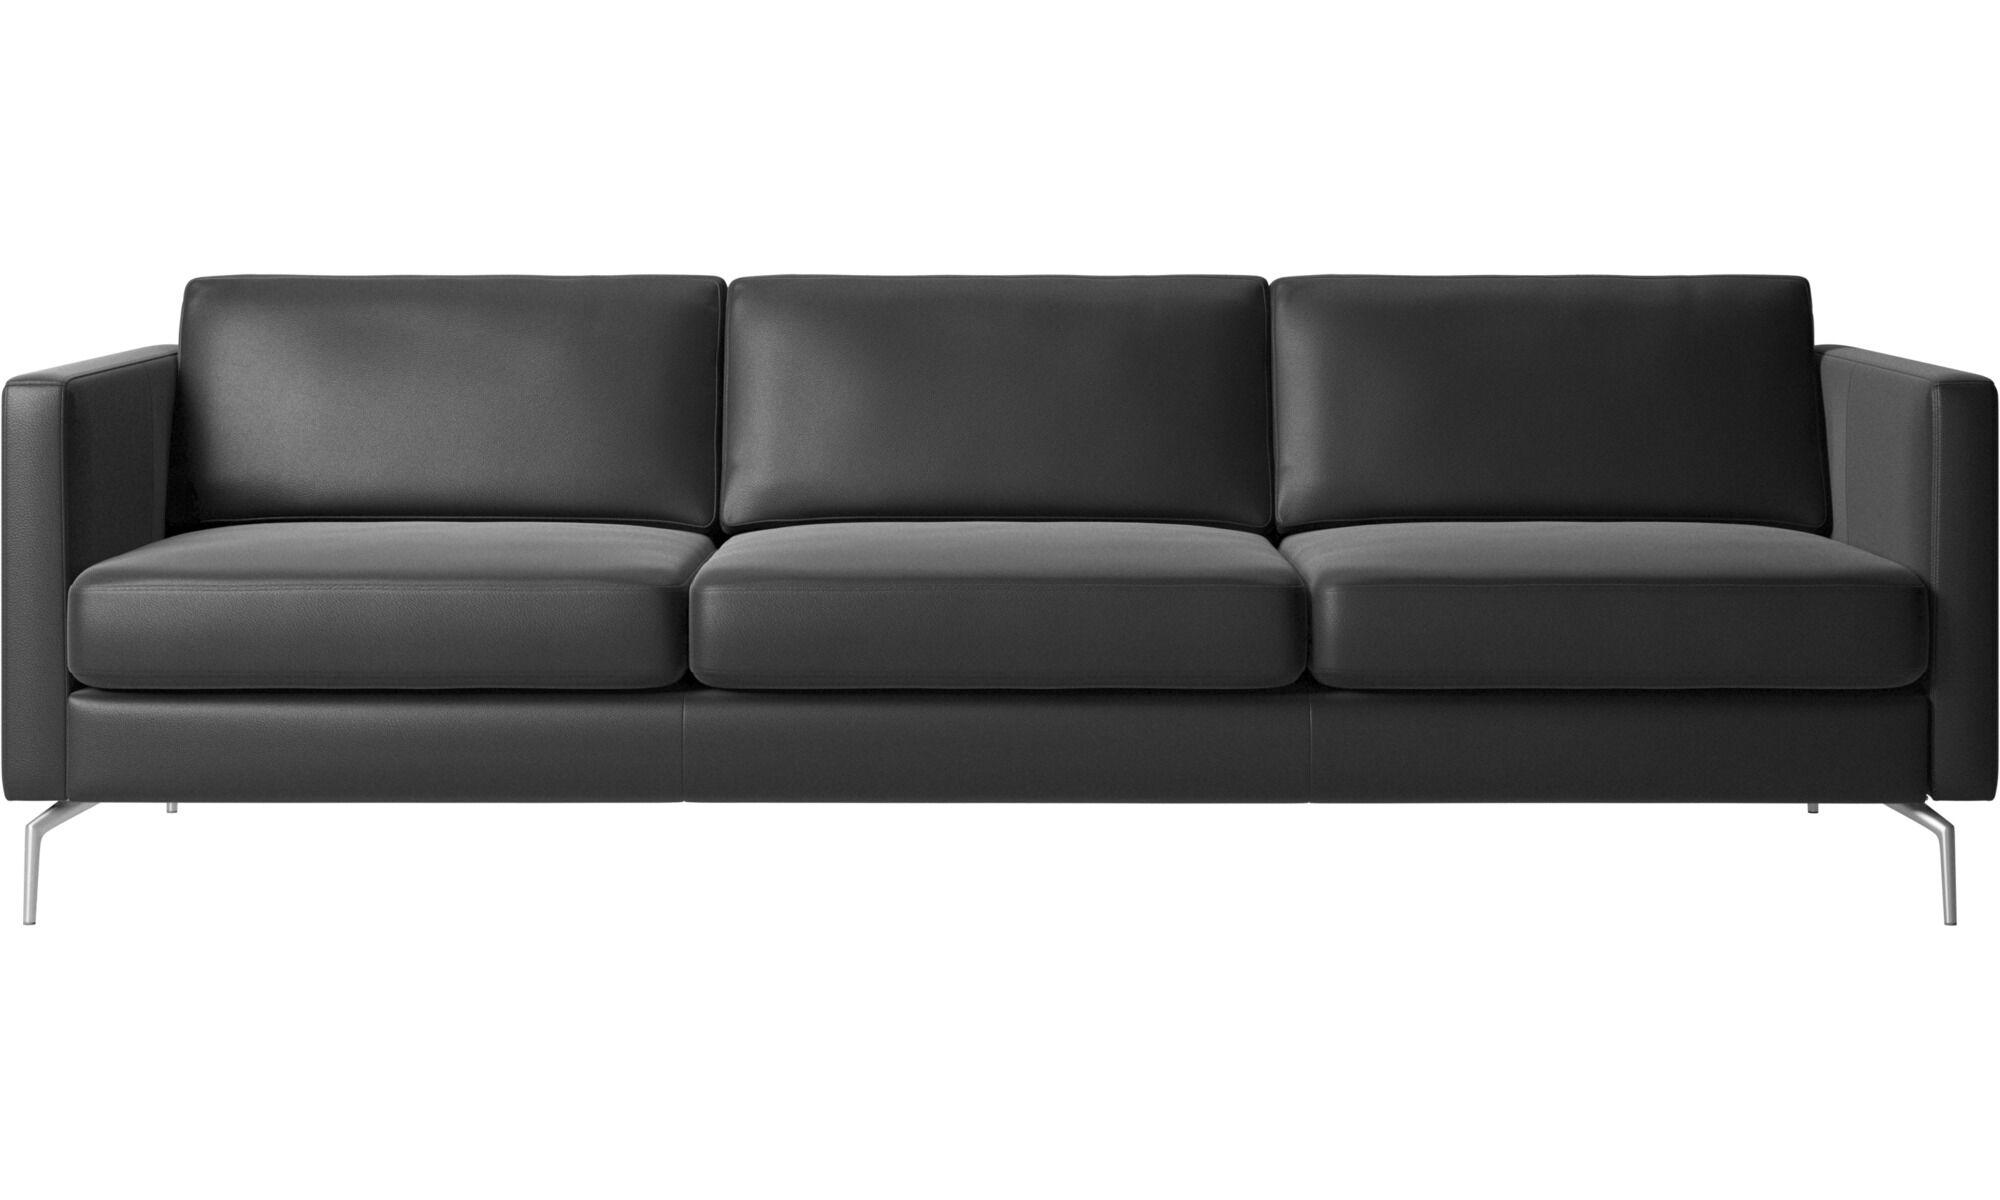 3 seater sofa black leather modular sofas osaka regular seat boconcept